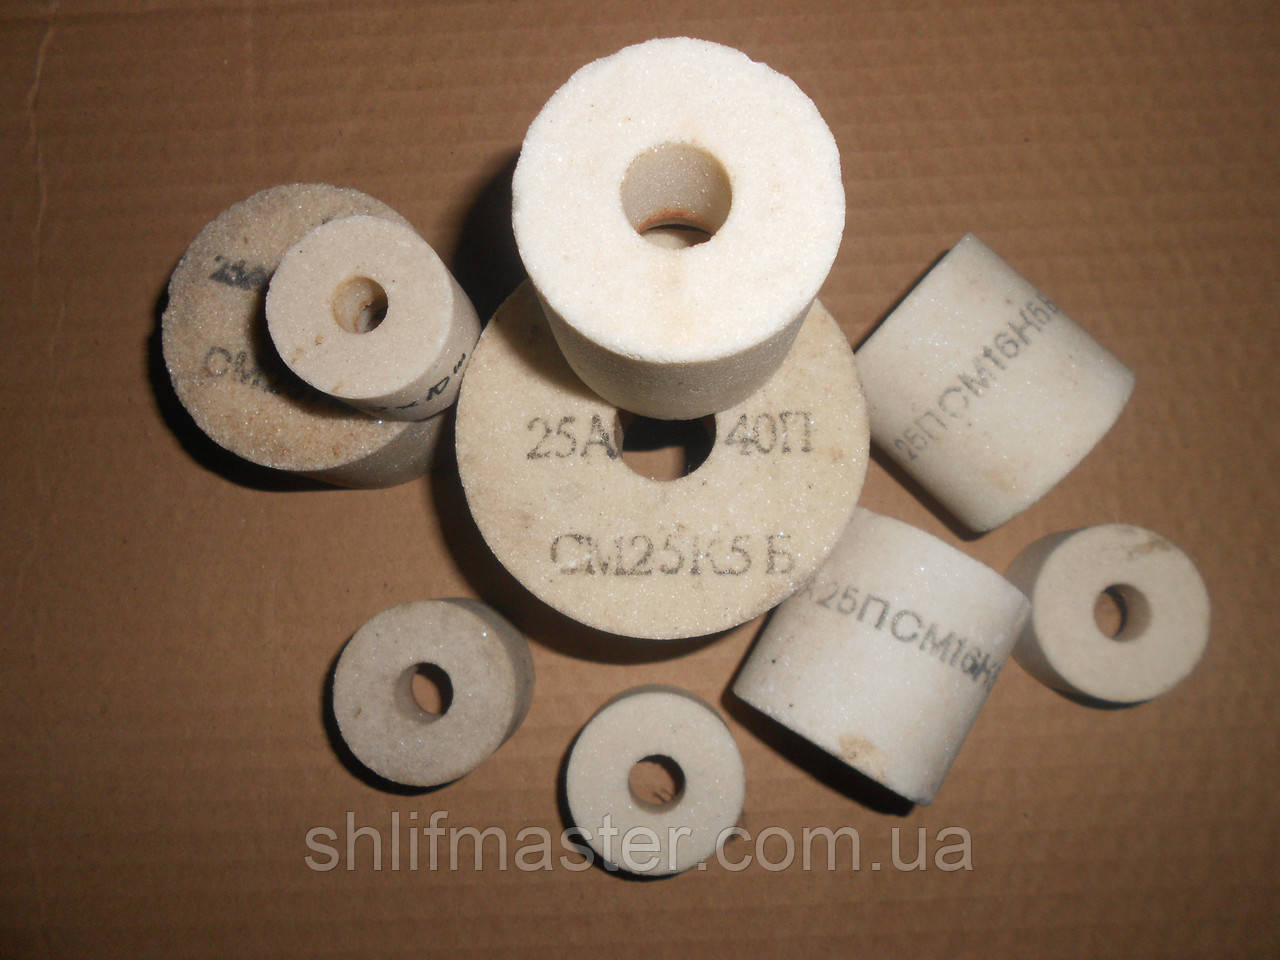 Абразивный круг шлифовальный (электрокорунд белый) 25А ПП 32Х20Х6